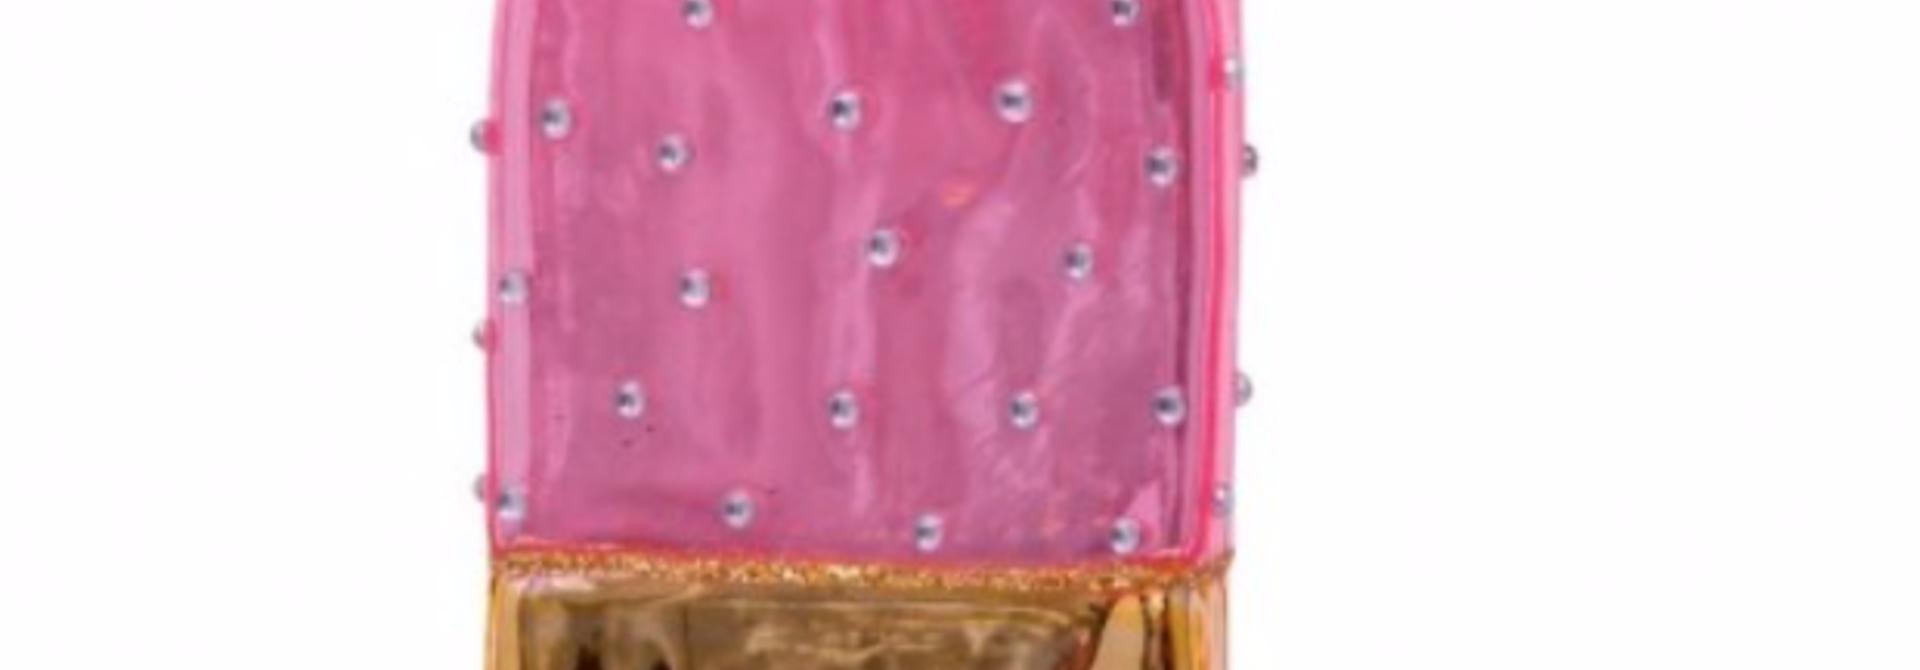 Kersthanger gold/pink icecream